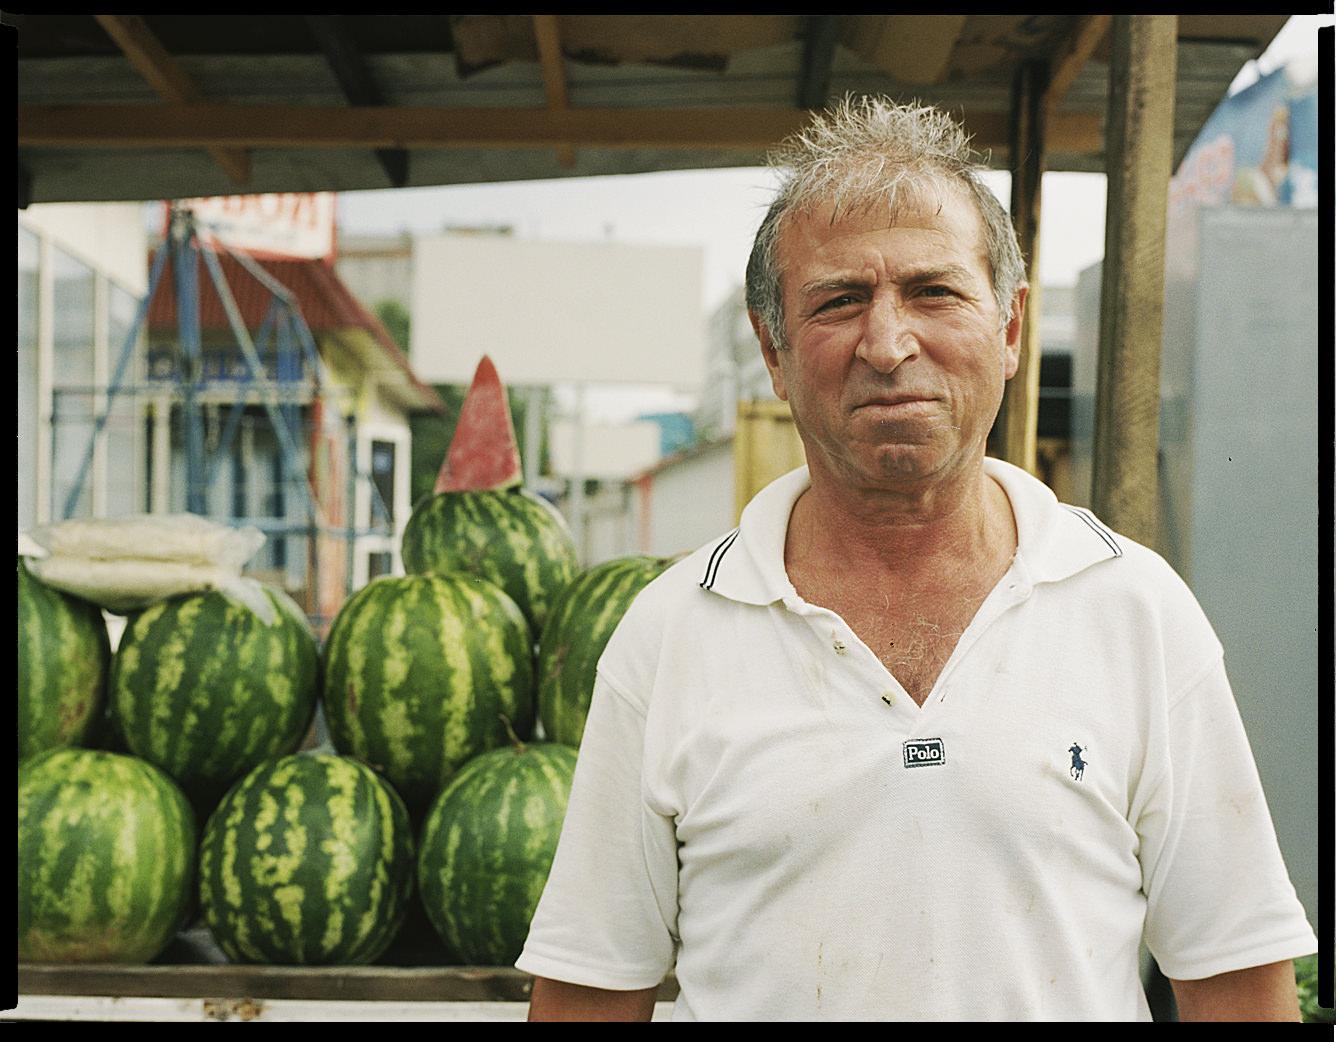 MediumFormatPatrikWallner_Krasnoyarsk_WatermelonManPortraitLOWQ